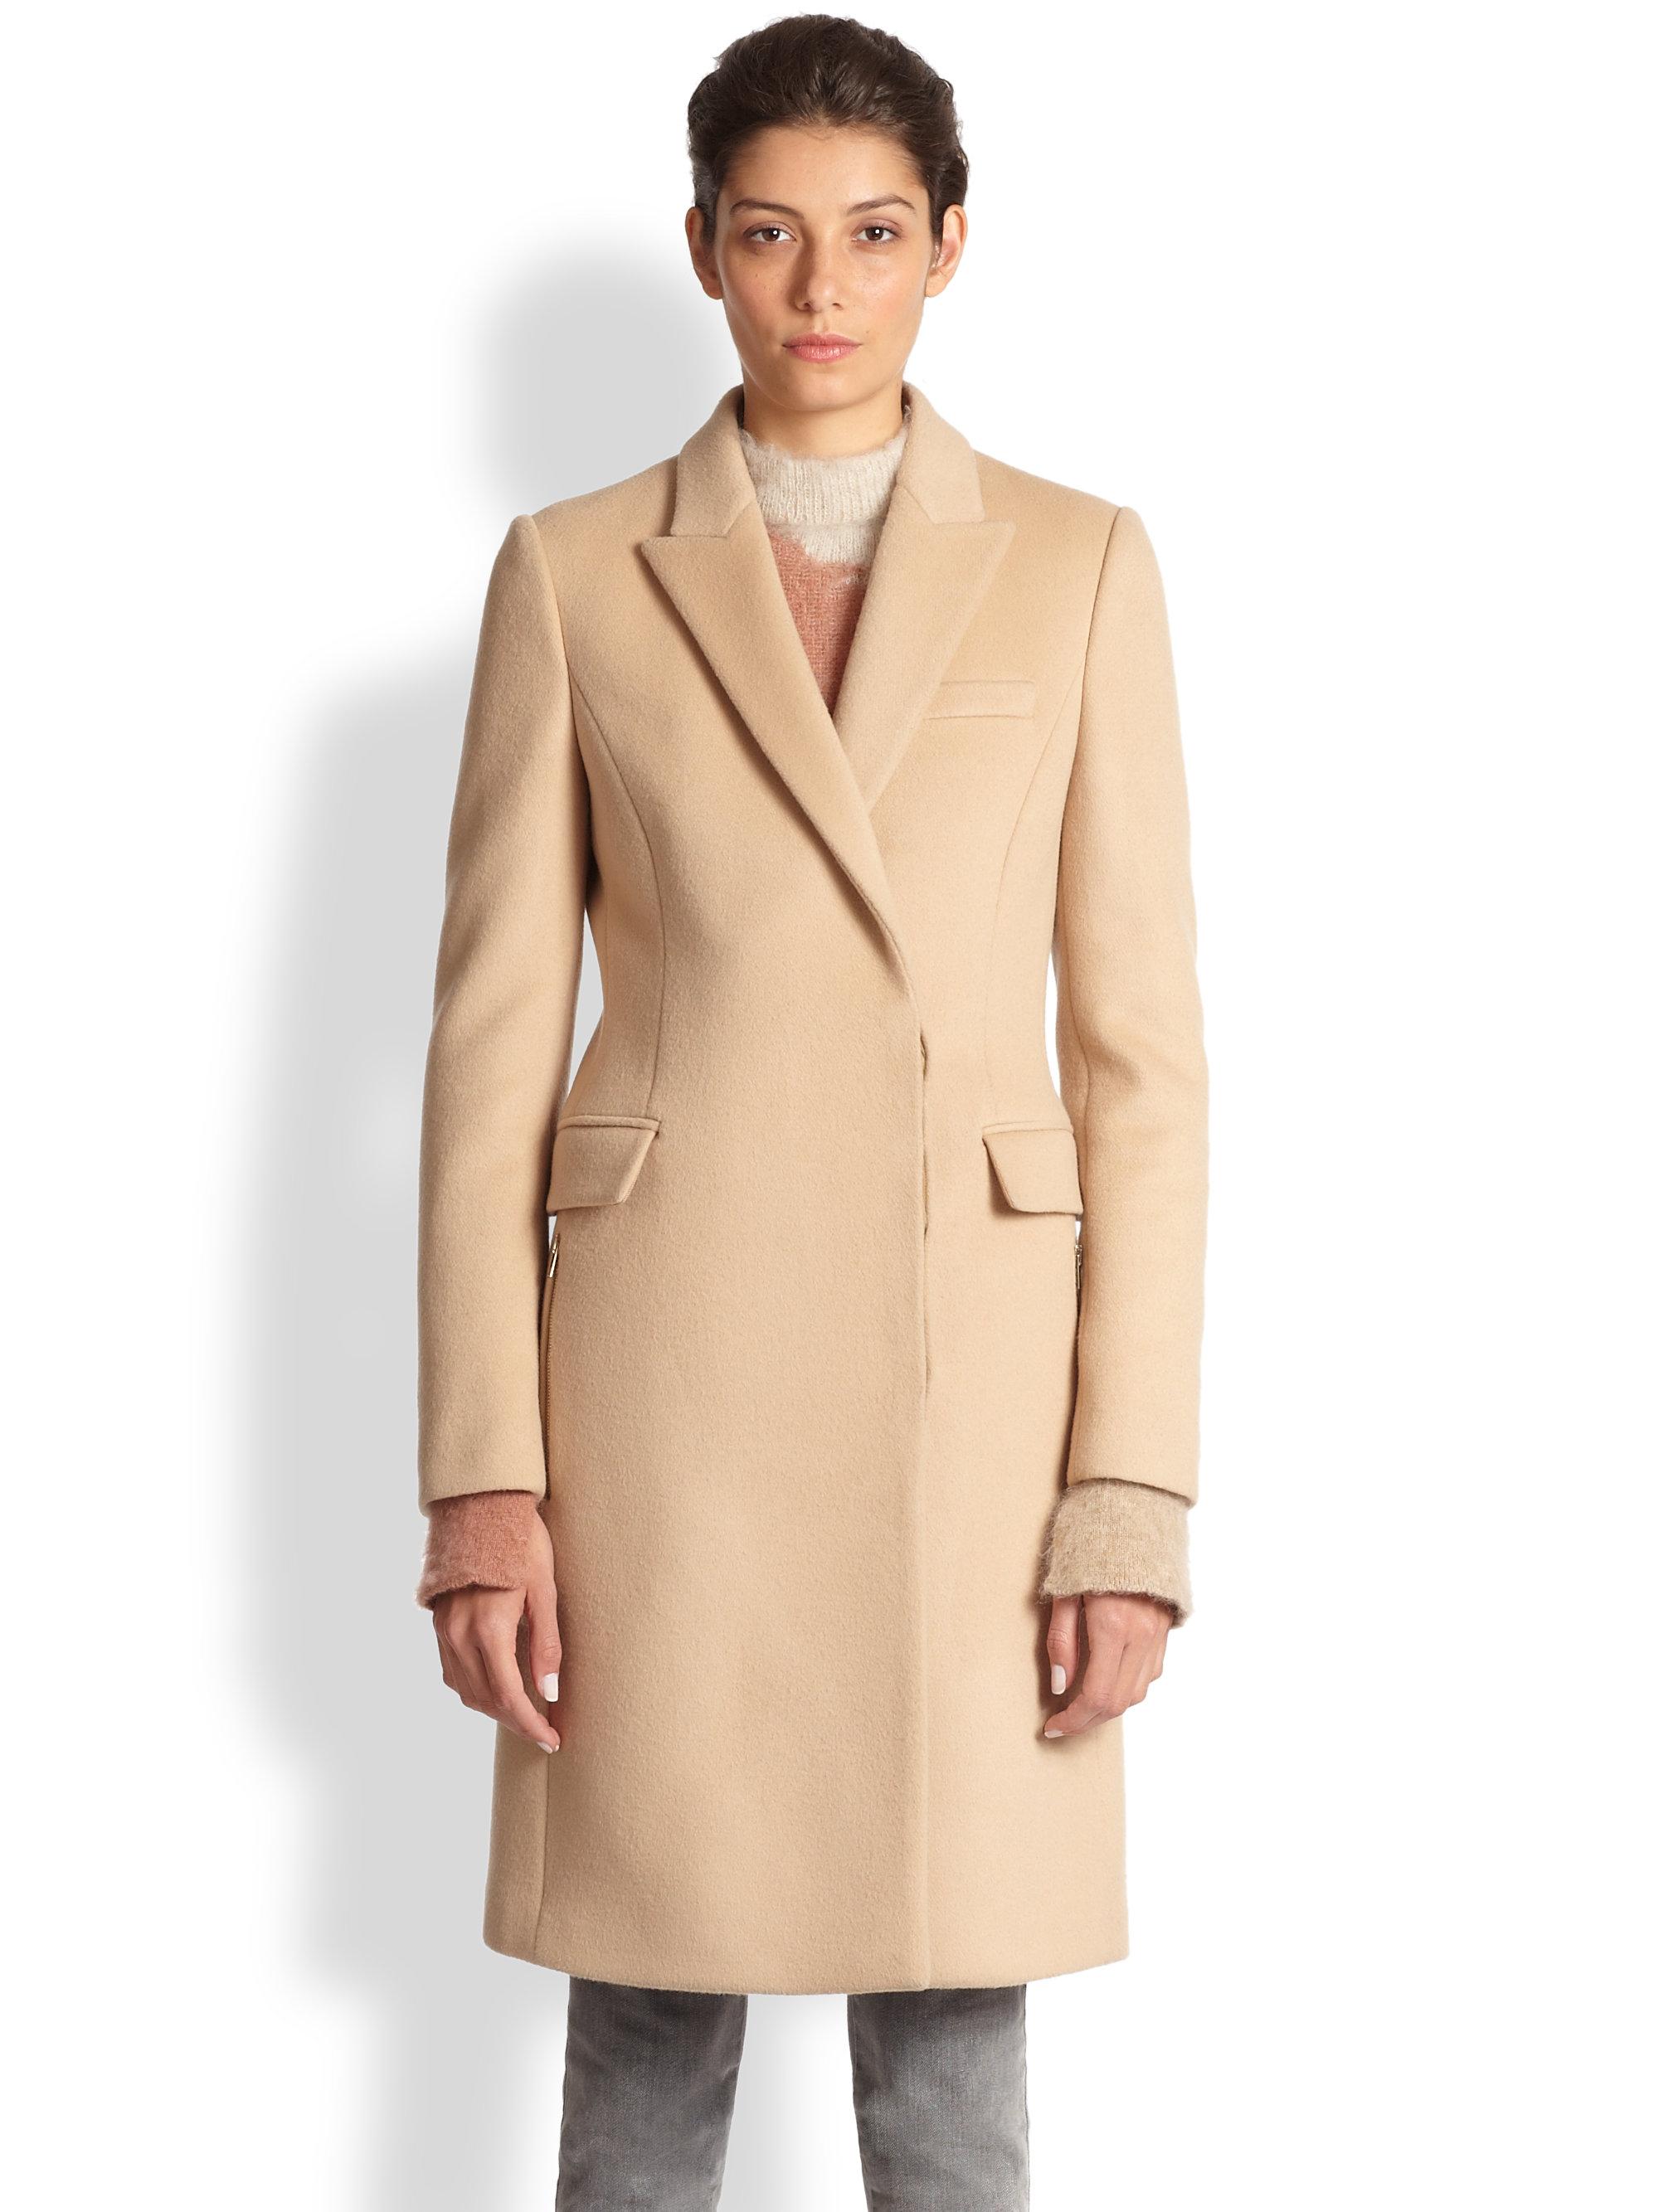 Stella Mccartney Florence Camel Coat In Brown Navy Multi